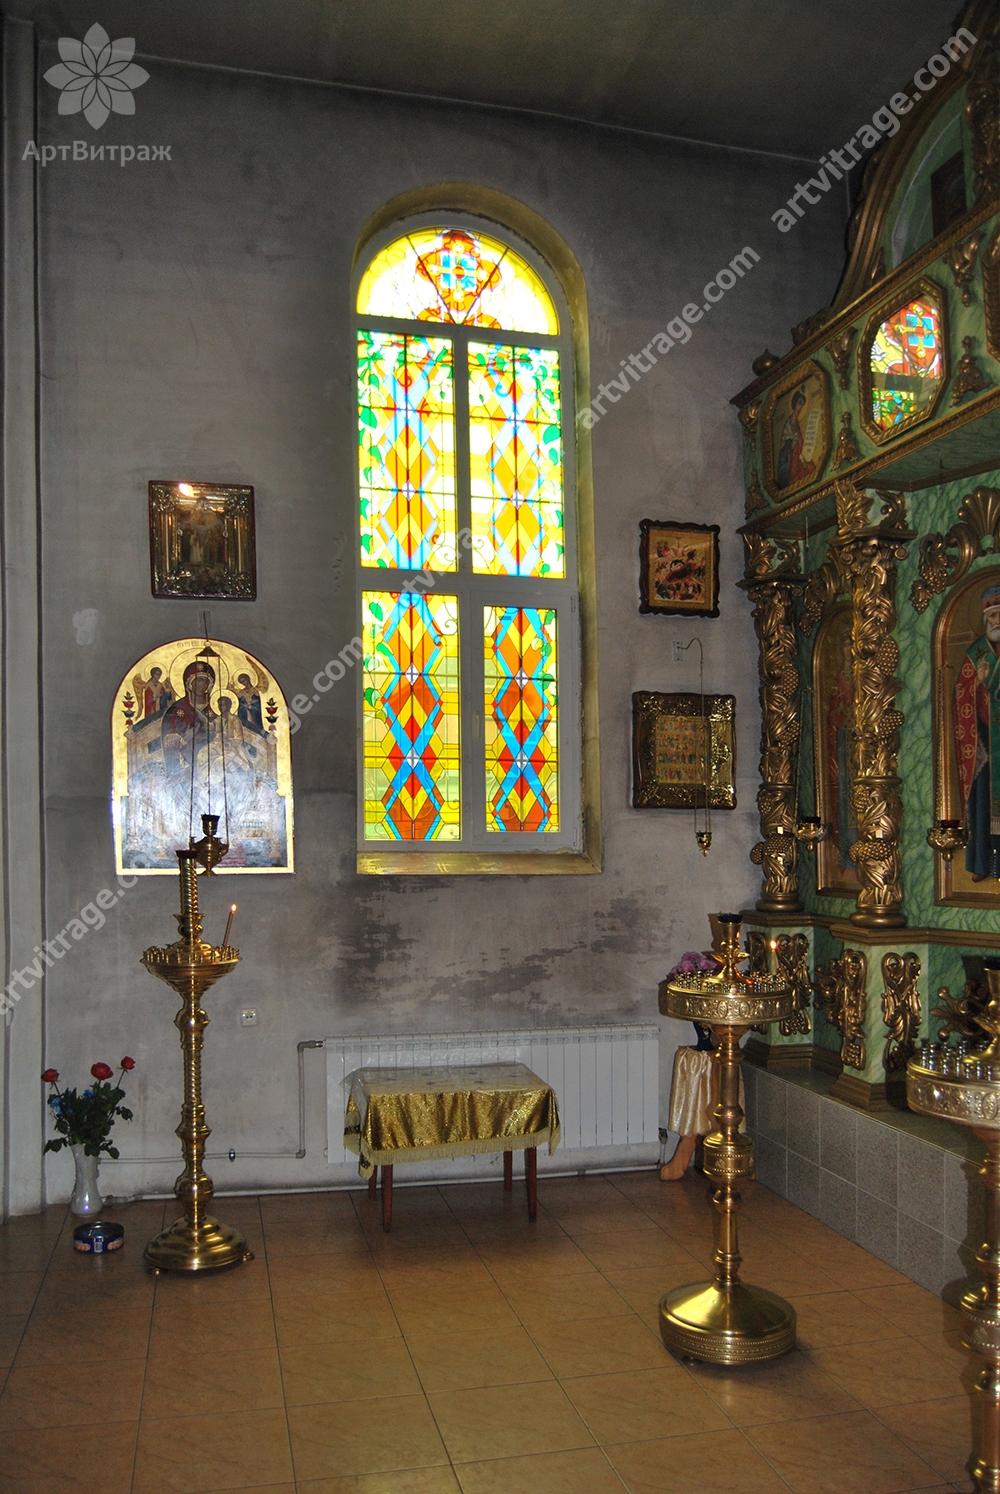 Витраж в окно храма